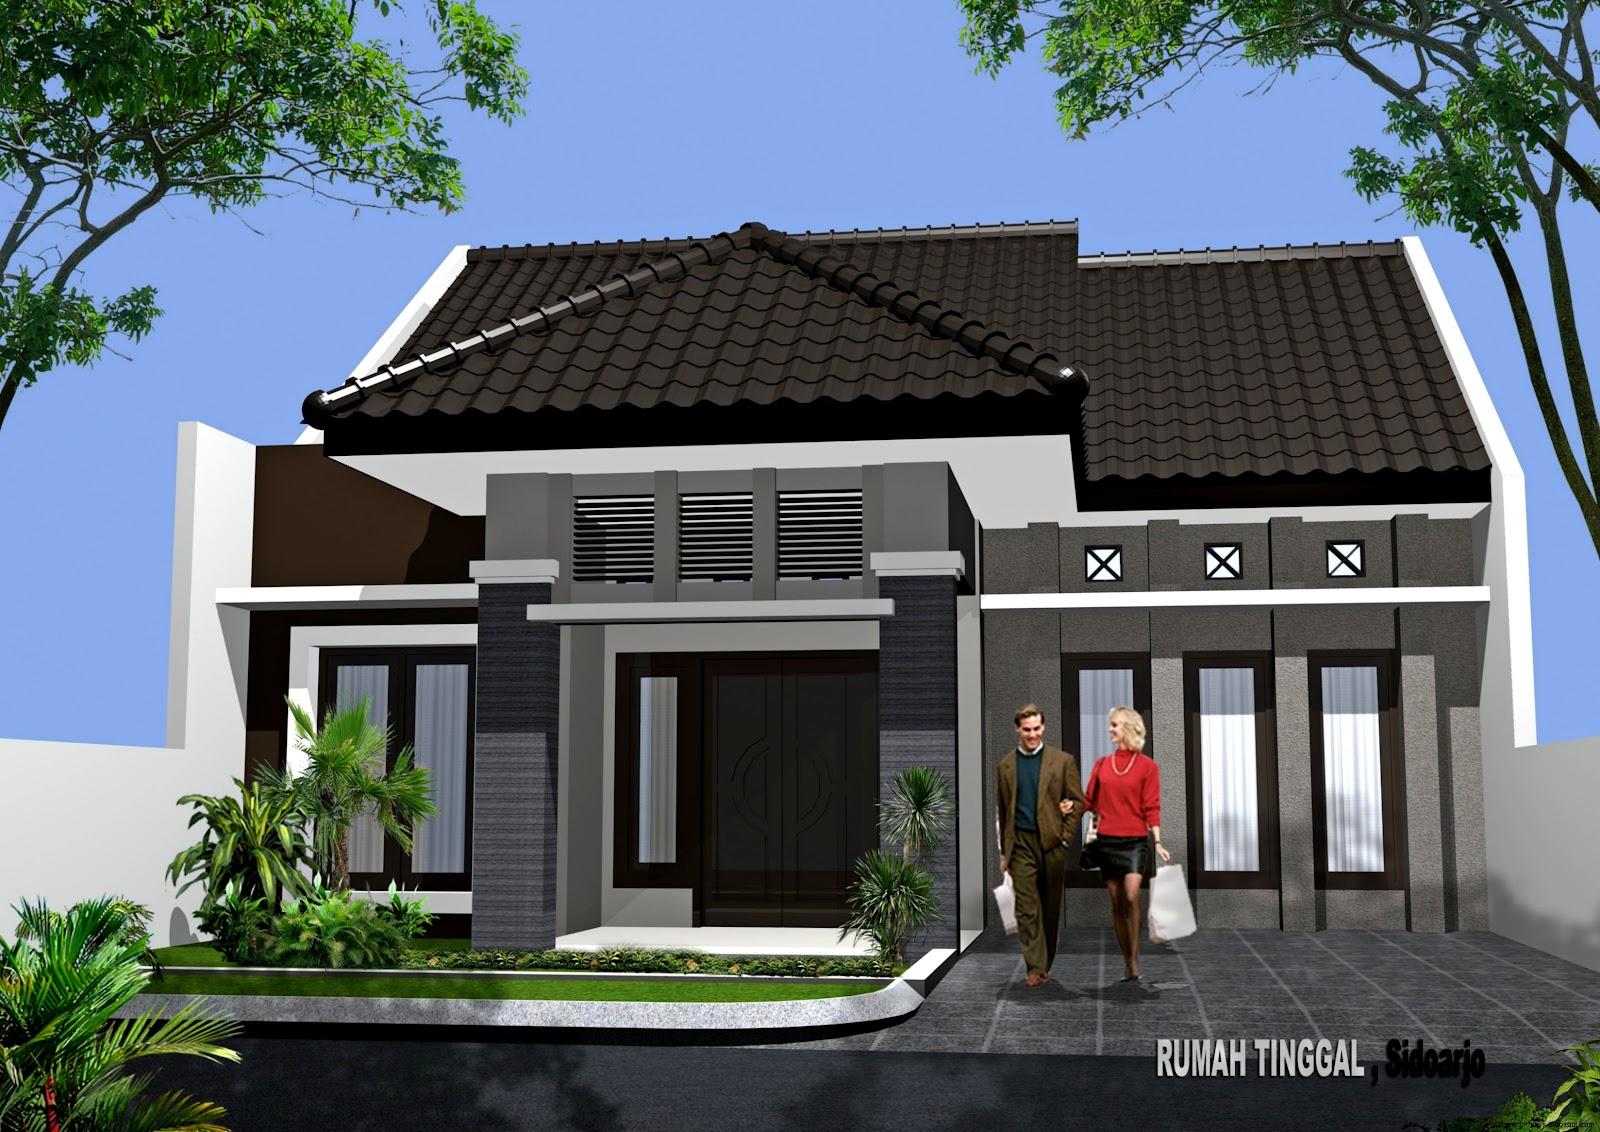 Wwwgambar Rumah Minimaliscom Design Rumah Minimalis